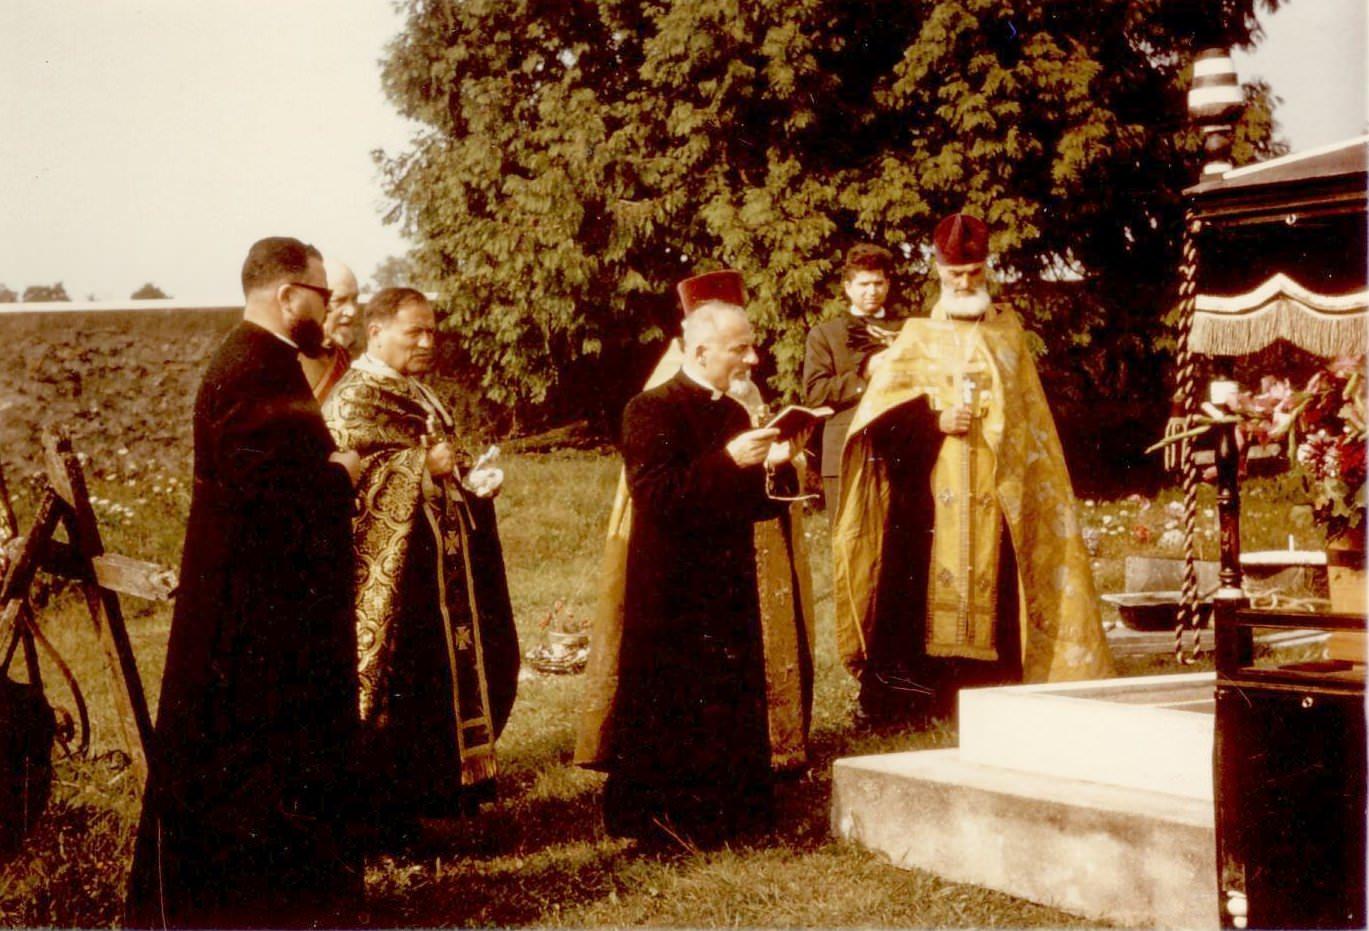 Mitropolitul Visarion Puiu - cimitirul din Viels-Maisons (Aisne) hp 3